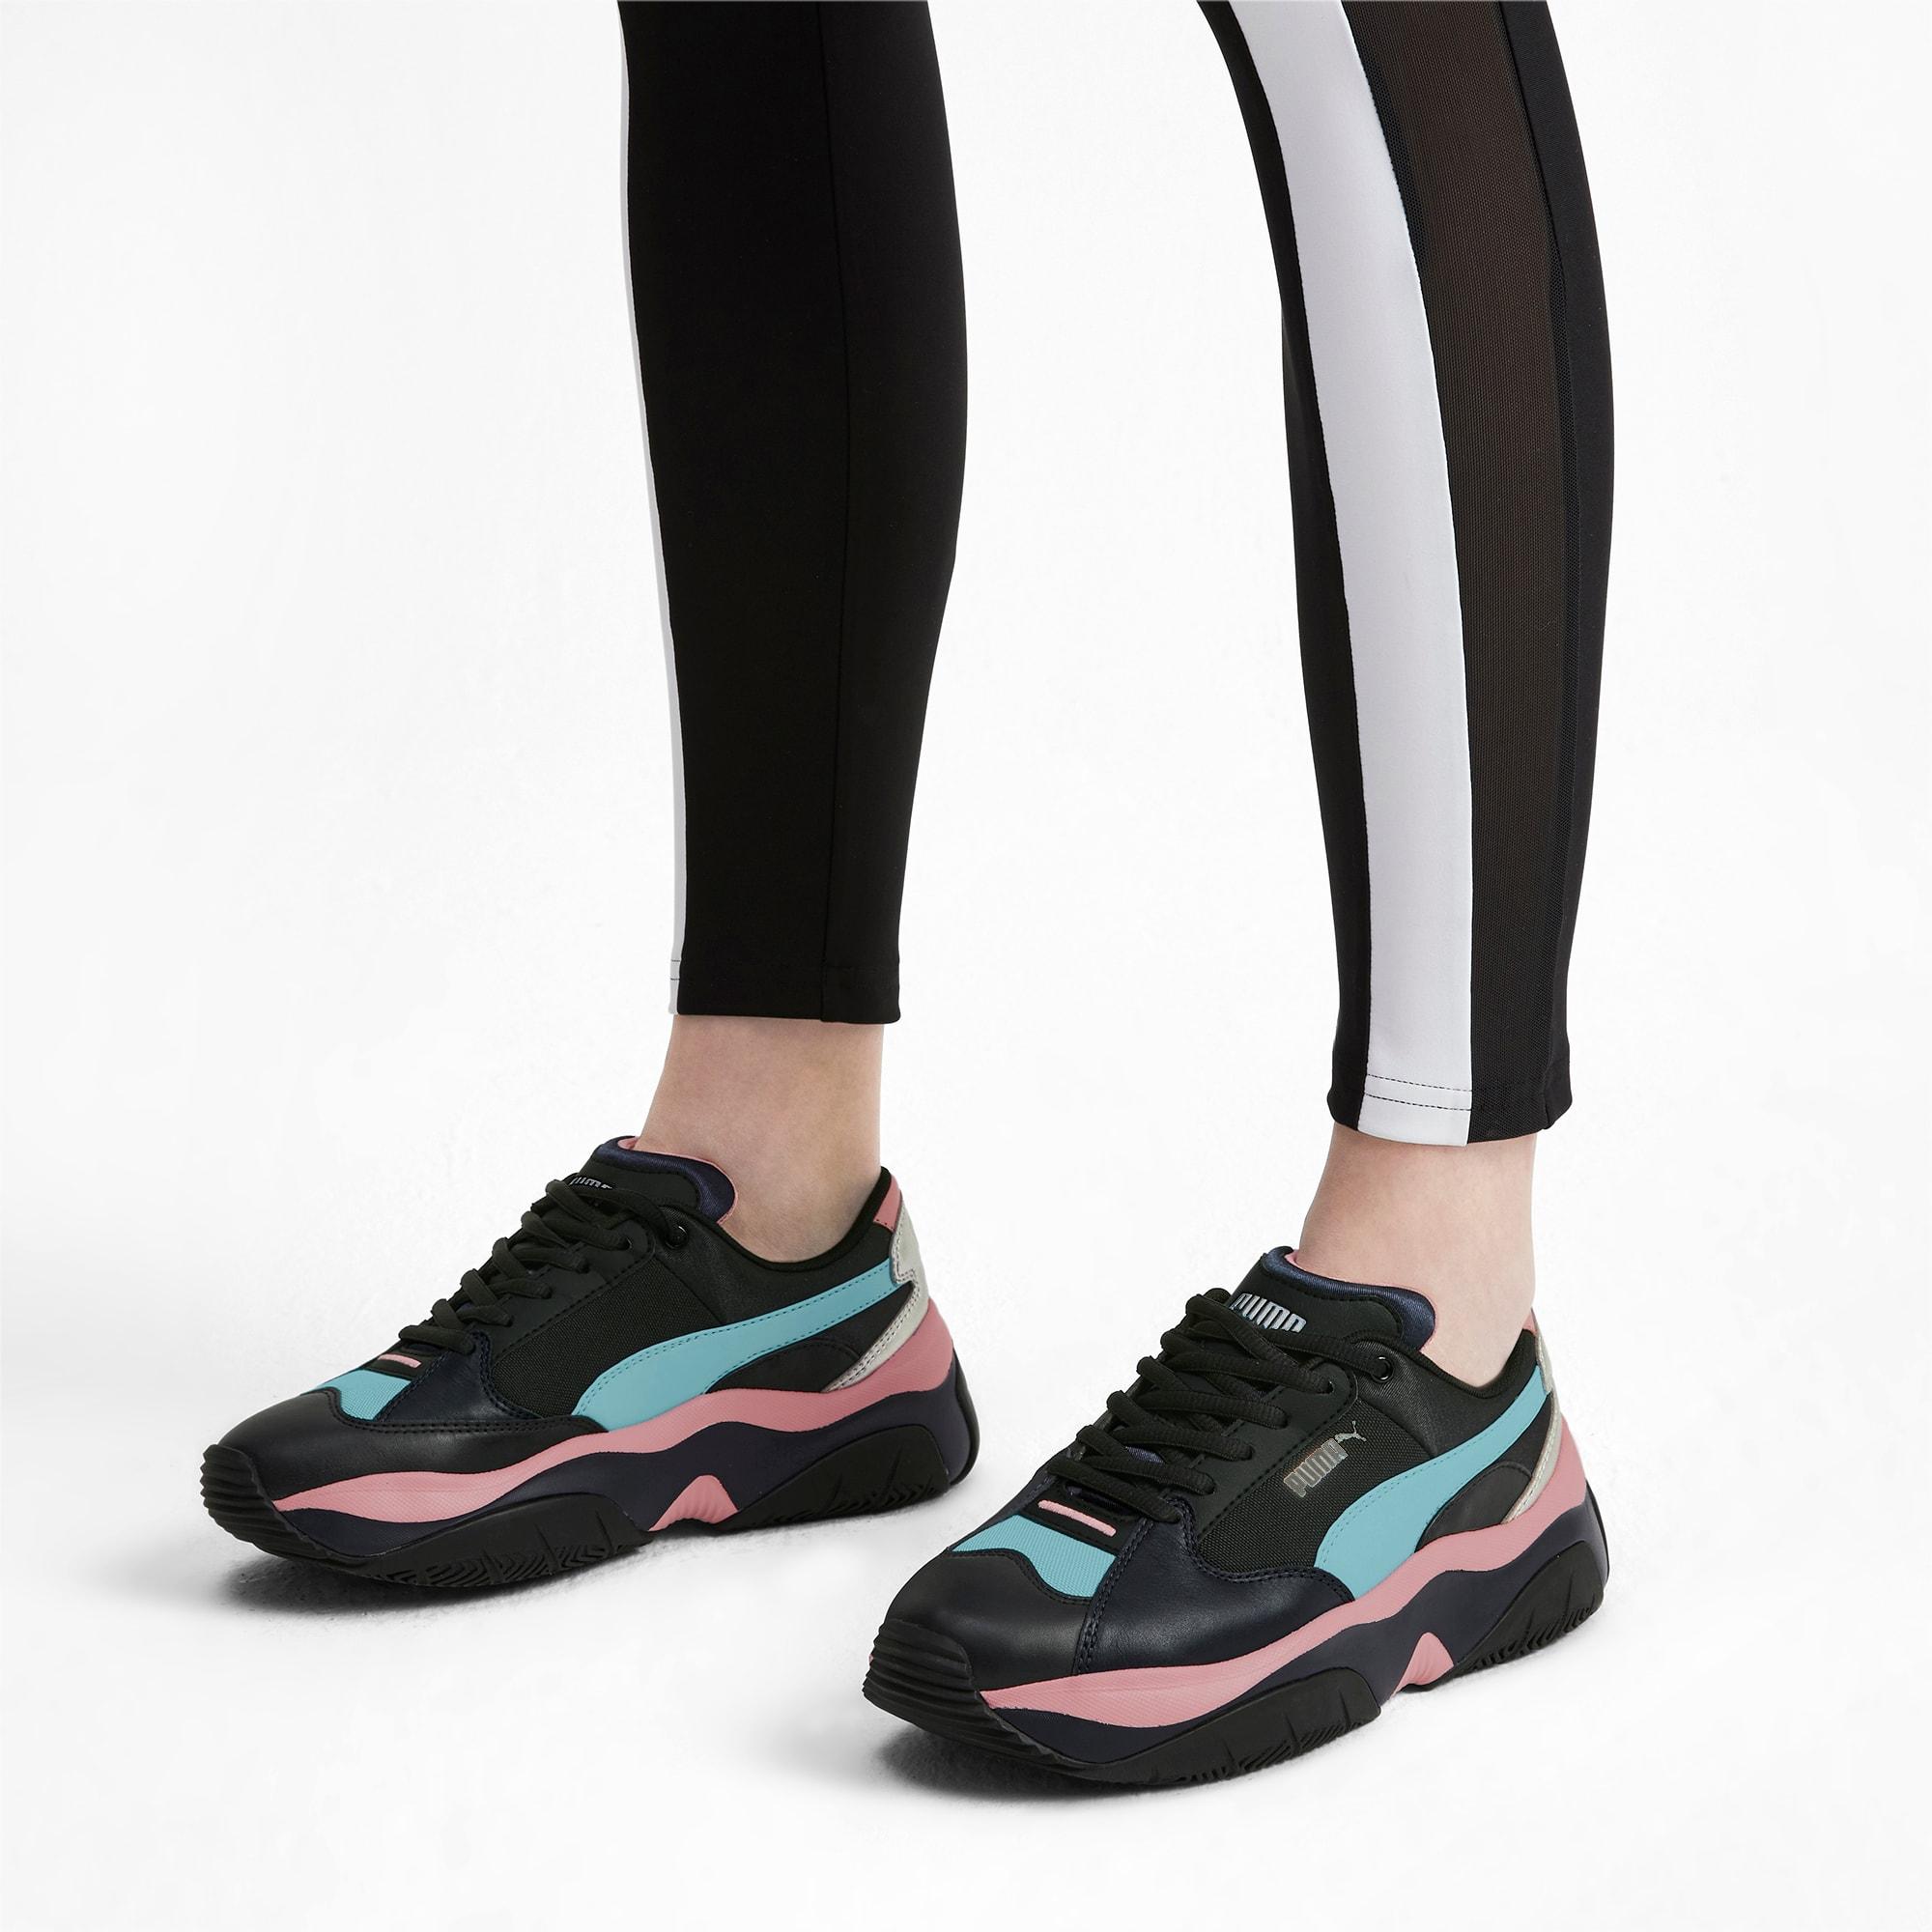 Scarpe da ginnastica STORM.Y Metallic donna | Peacoat | PUMA